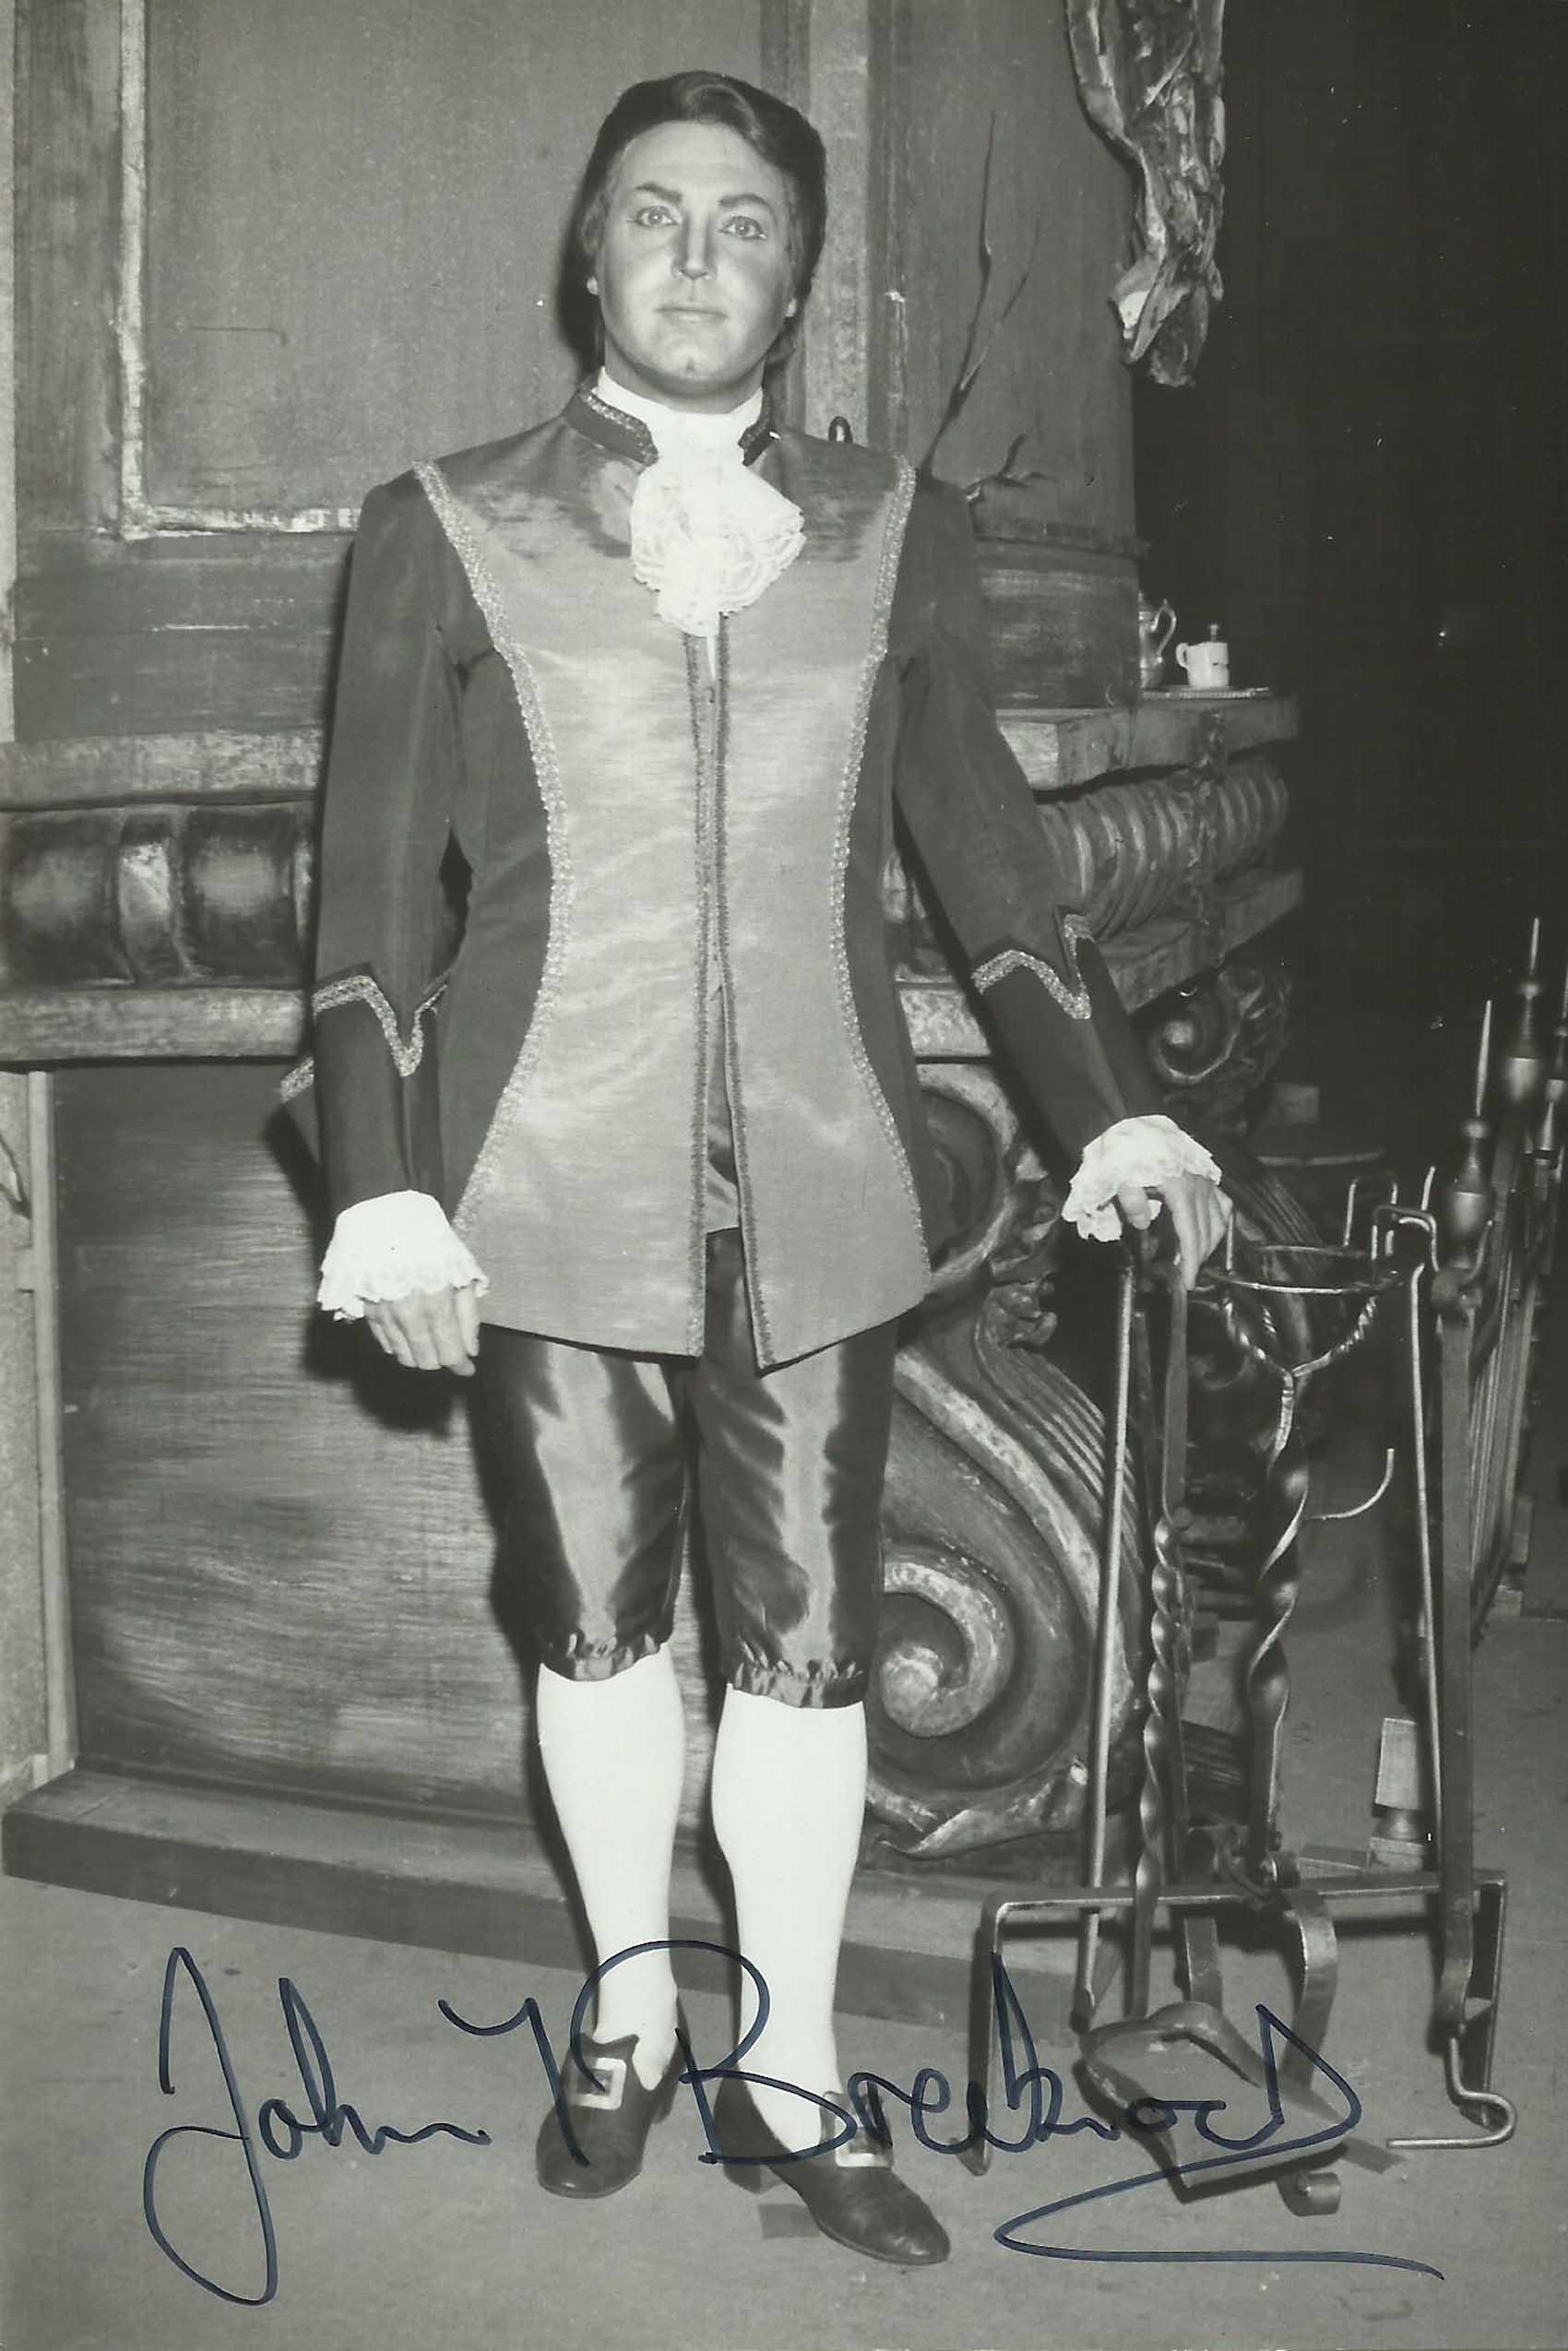 Death of an English tenor, 79